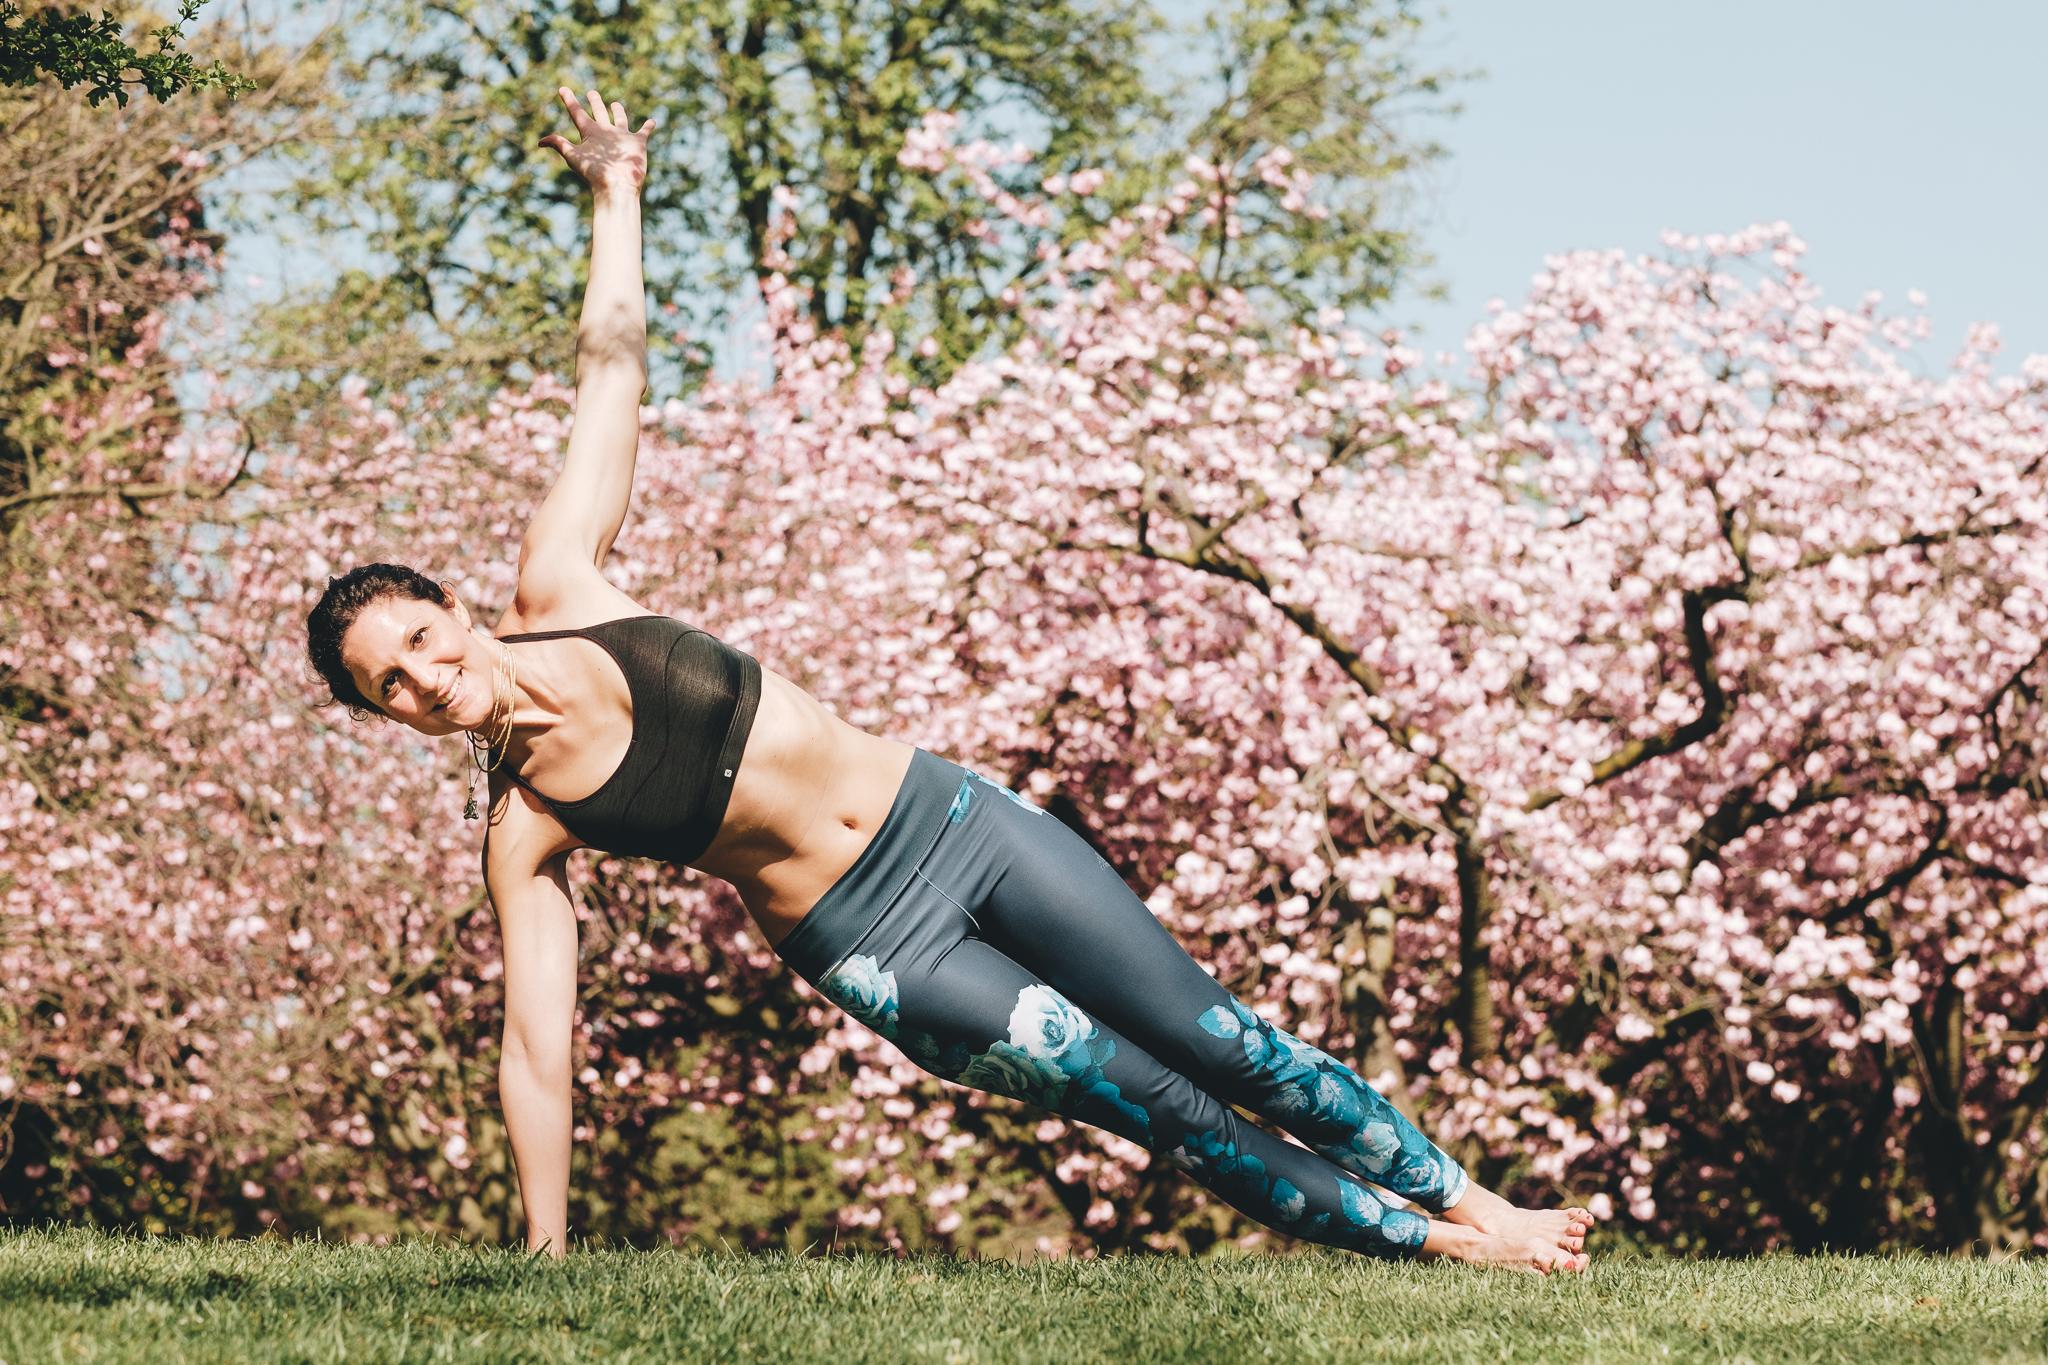 FXT13600 London Yoga Photographer Alma Yoga | A Very Spring Yoga Photoshoot in London